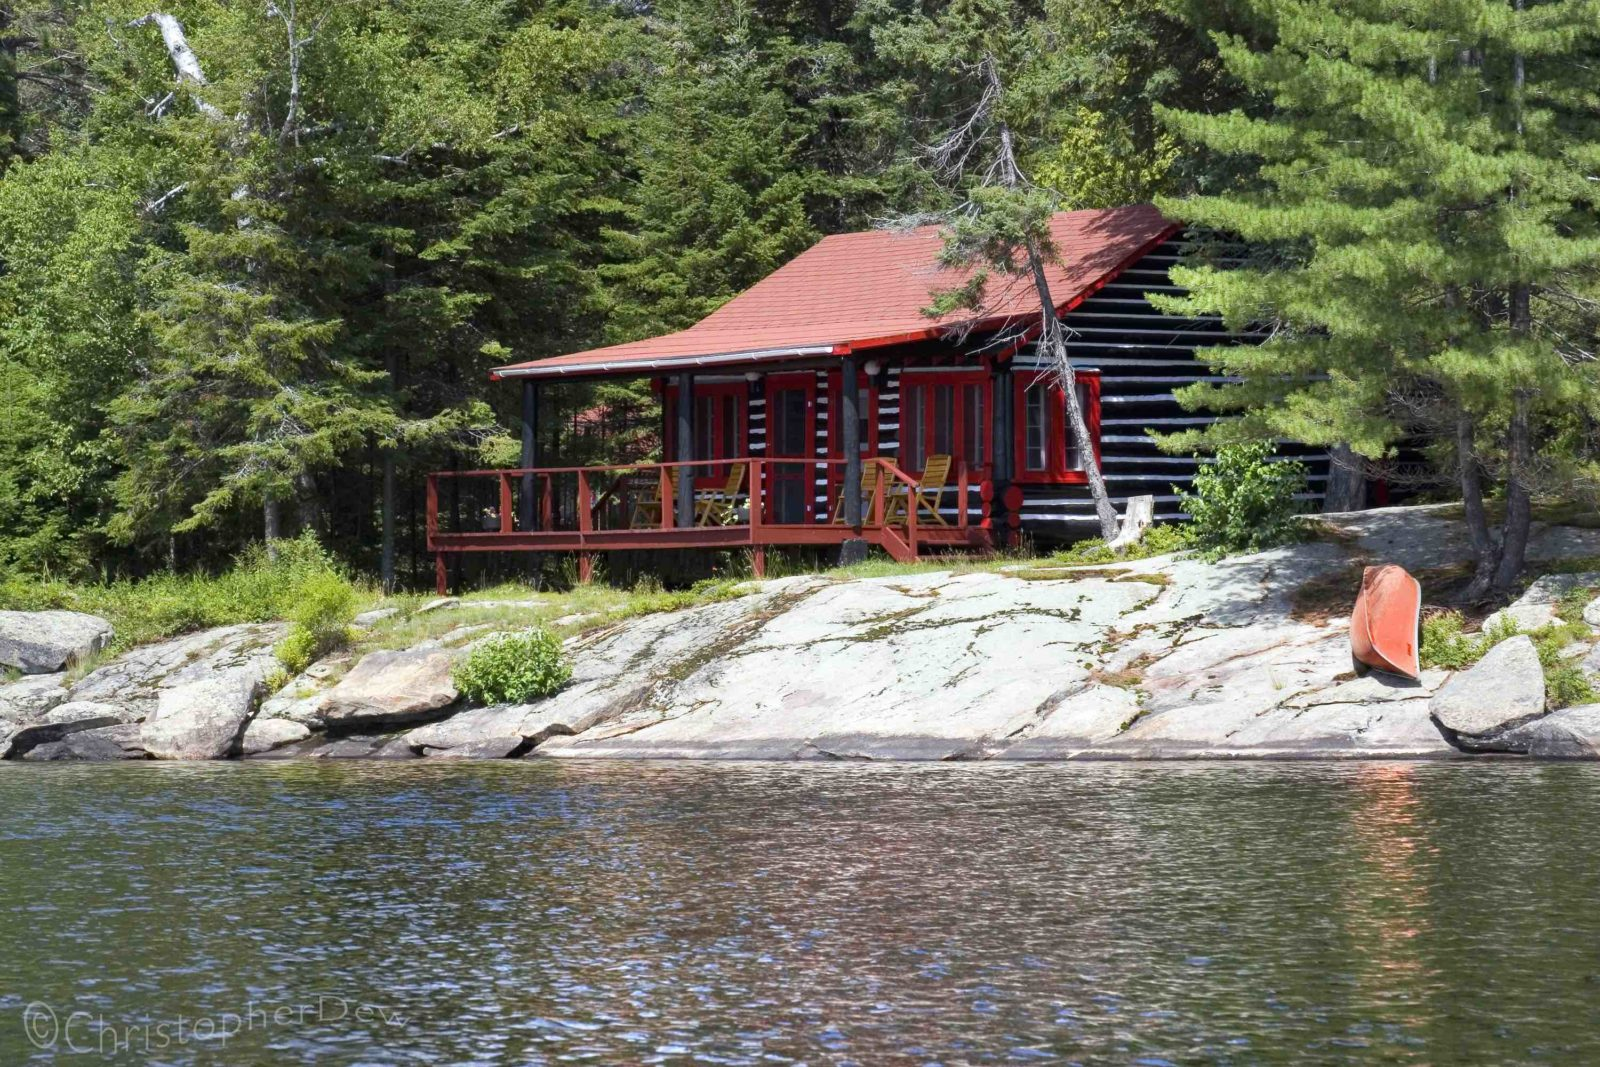 Killarney Lodge rustic cabin on the lake shore in summer